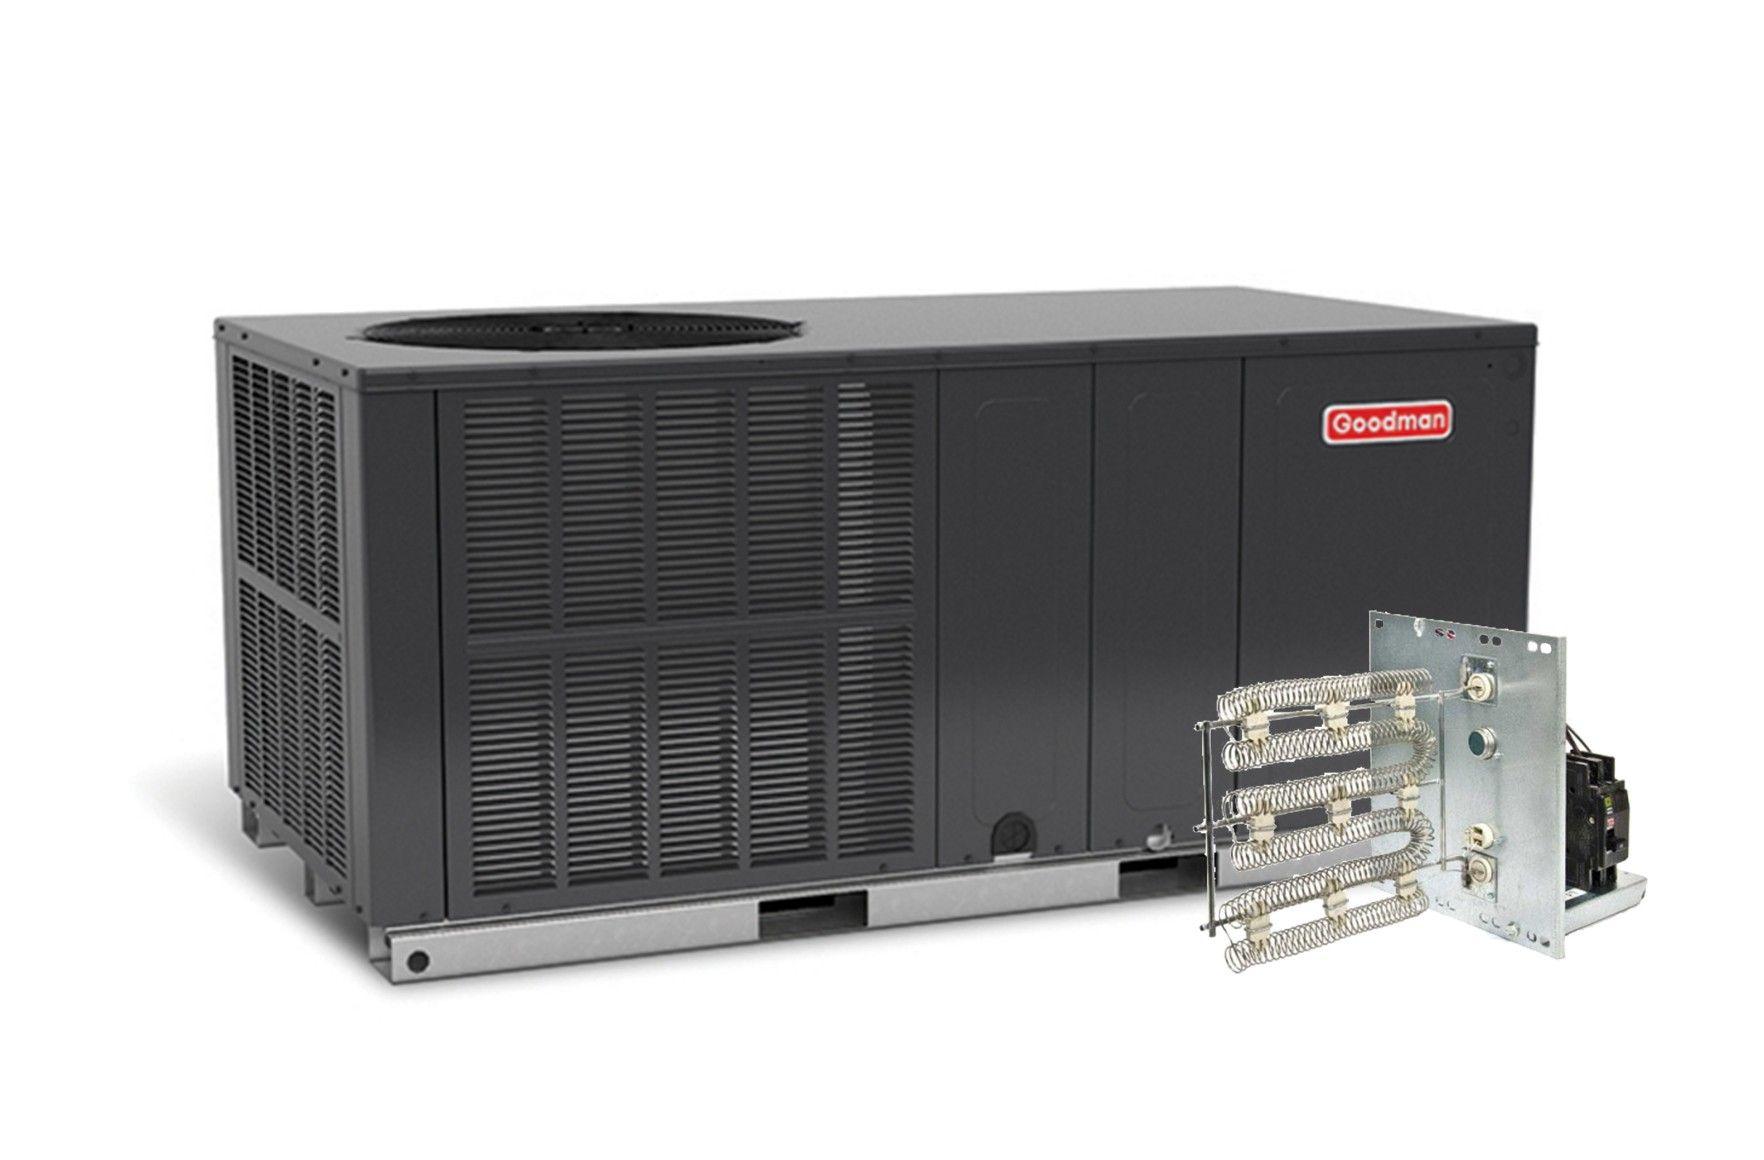 Goodman 5.0 Ton 16 SEER Single Stage Heat Pump Package Unit